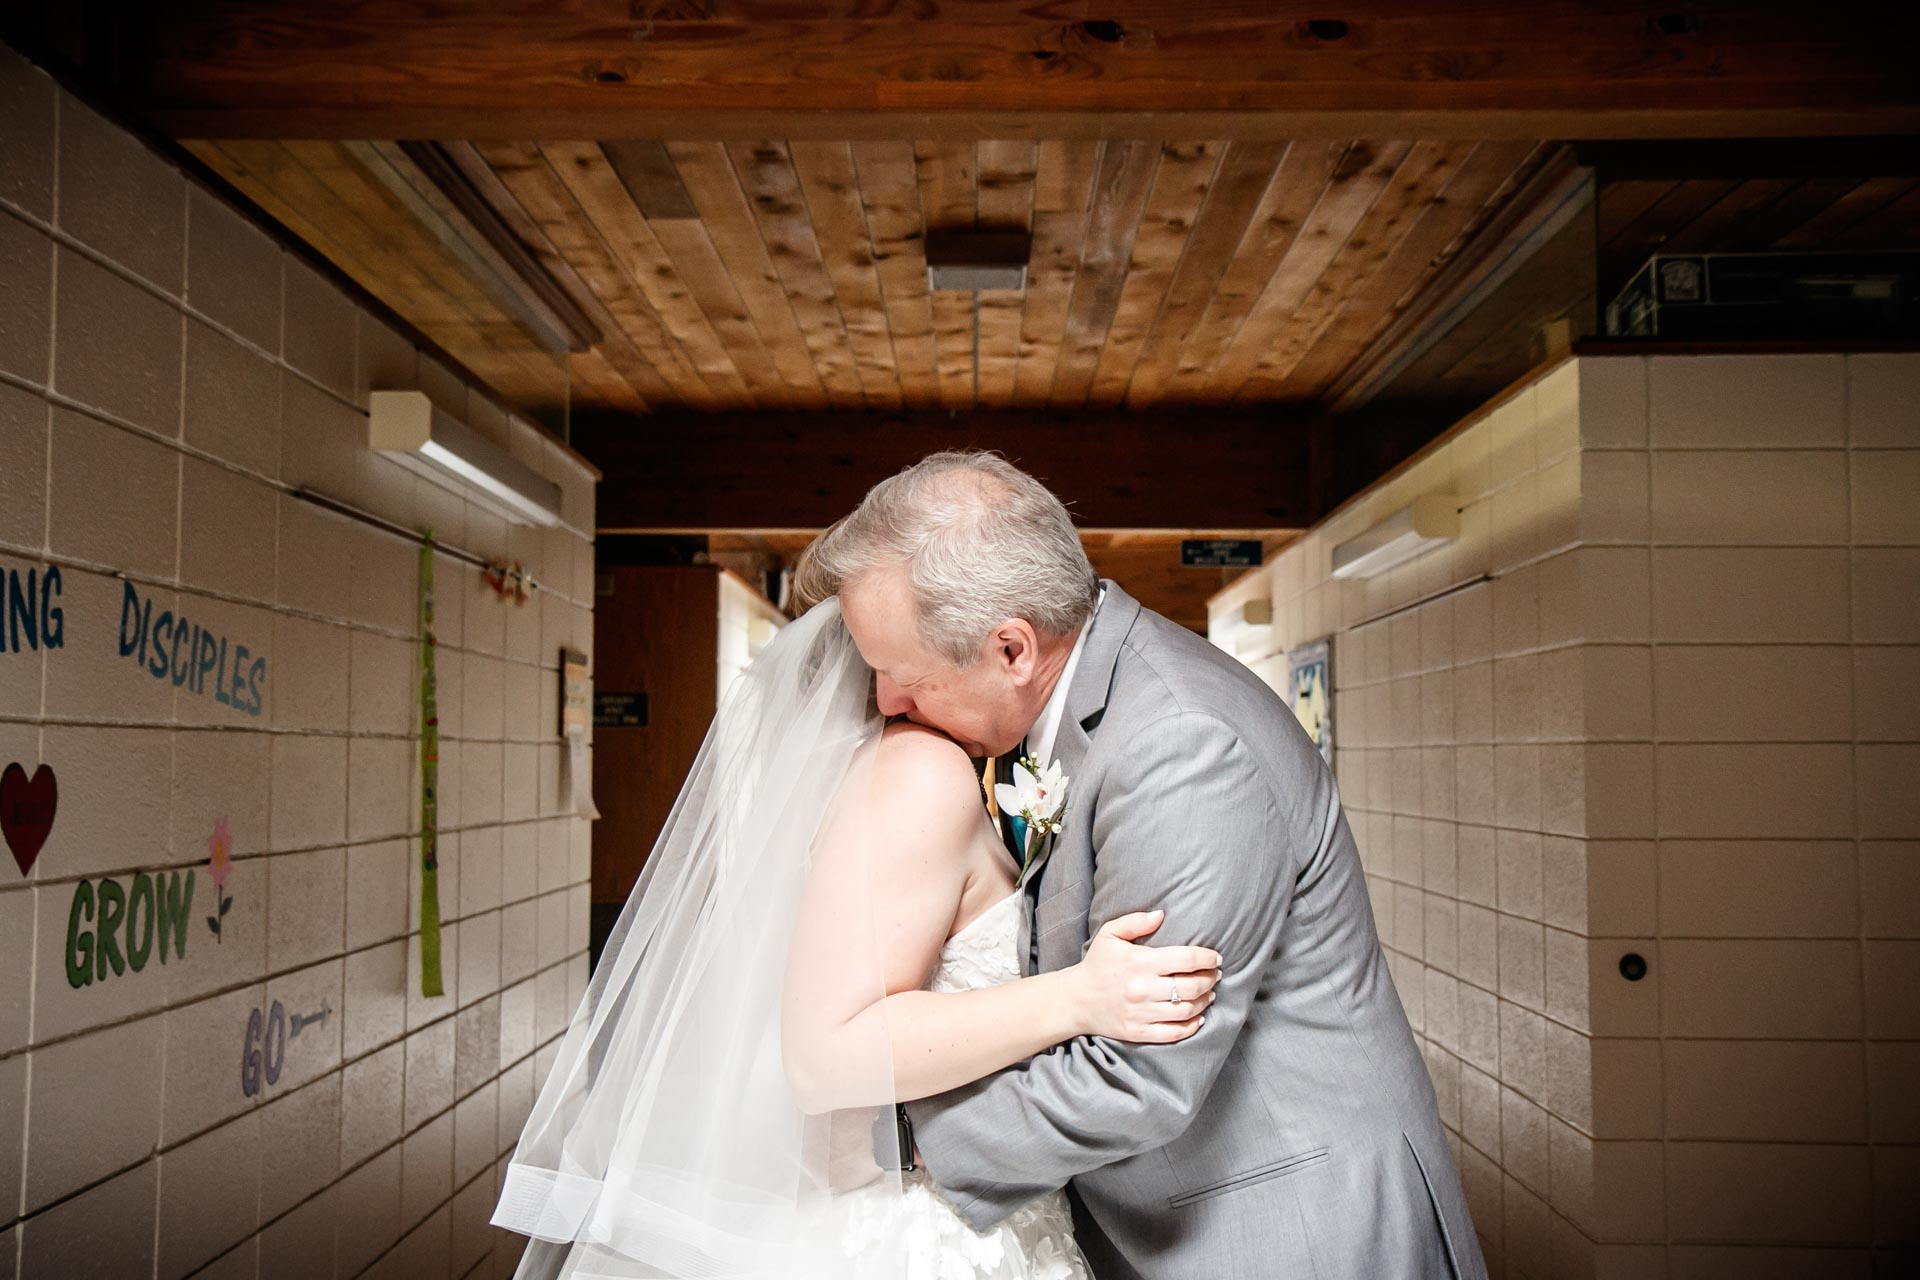 wedding-2-adam-shea-photography-green-bay-appleton-neenah-photographer-05.jpg